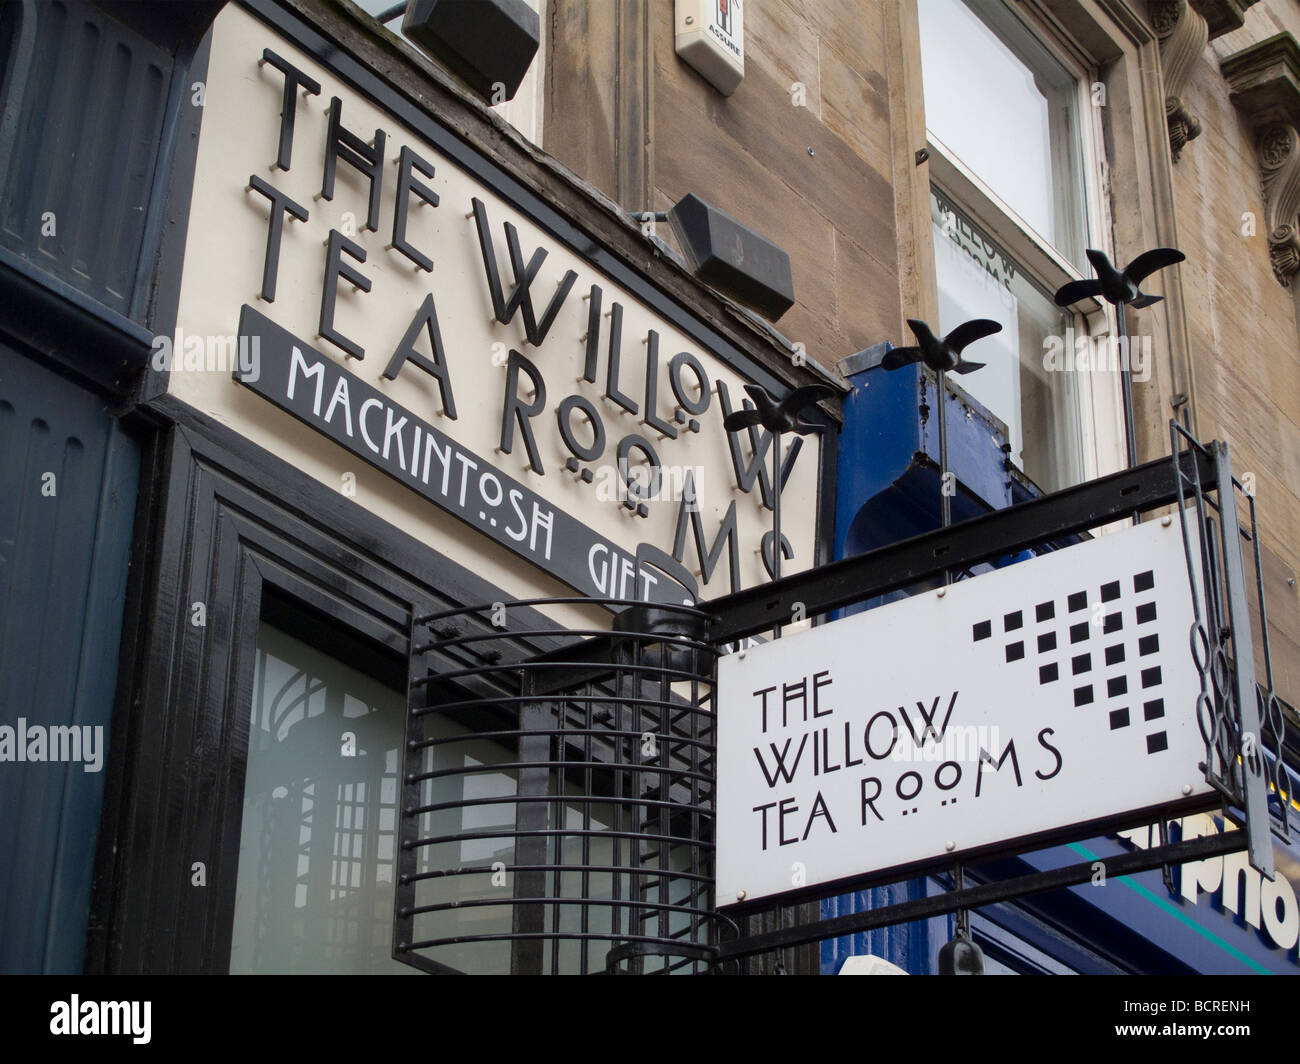 Sign outside the Willow Tea Rooms in Sauchiehall Street, Glasgow, Scotland, with Charles Rennie Mackintosh design Stock Photo